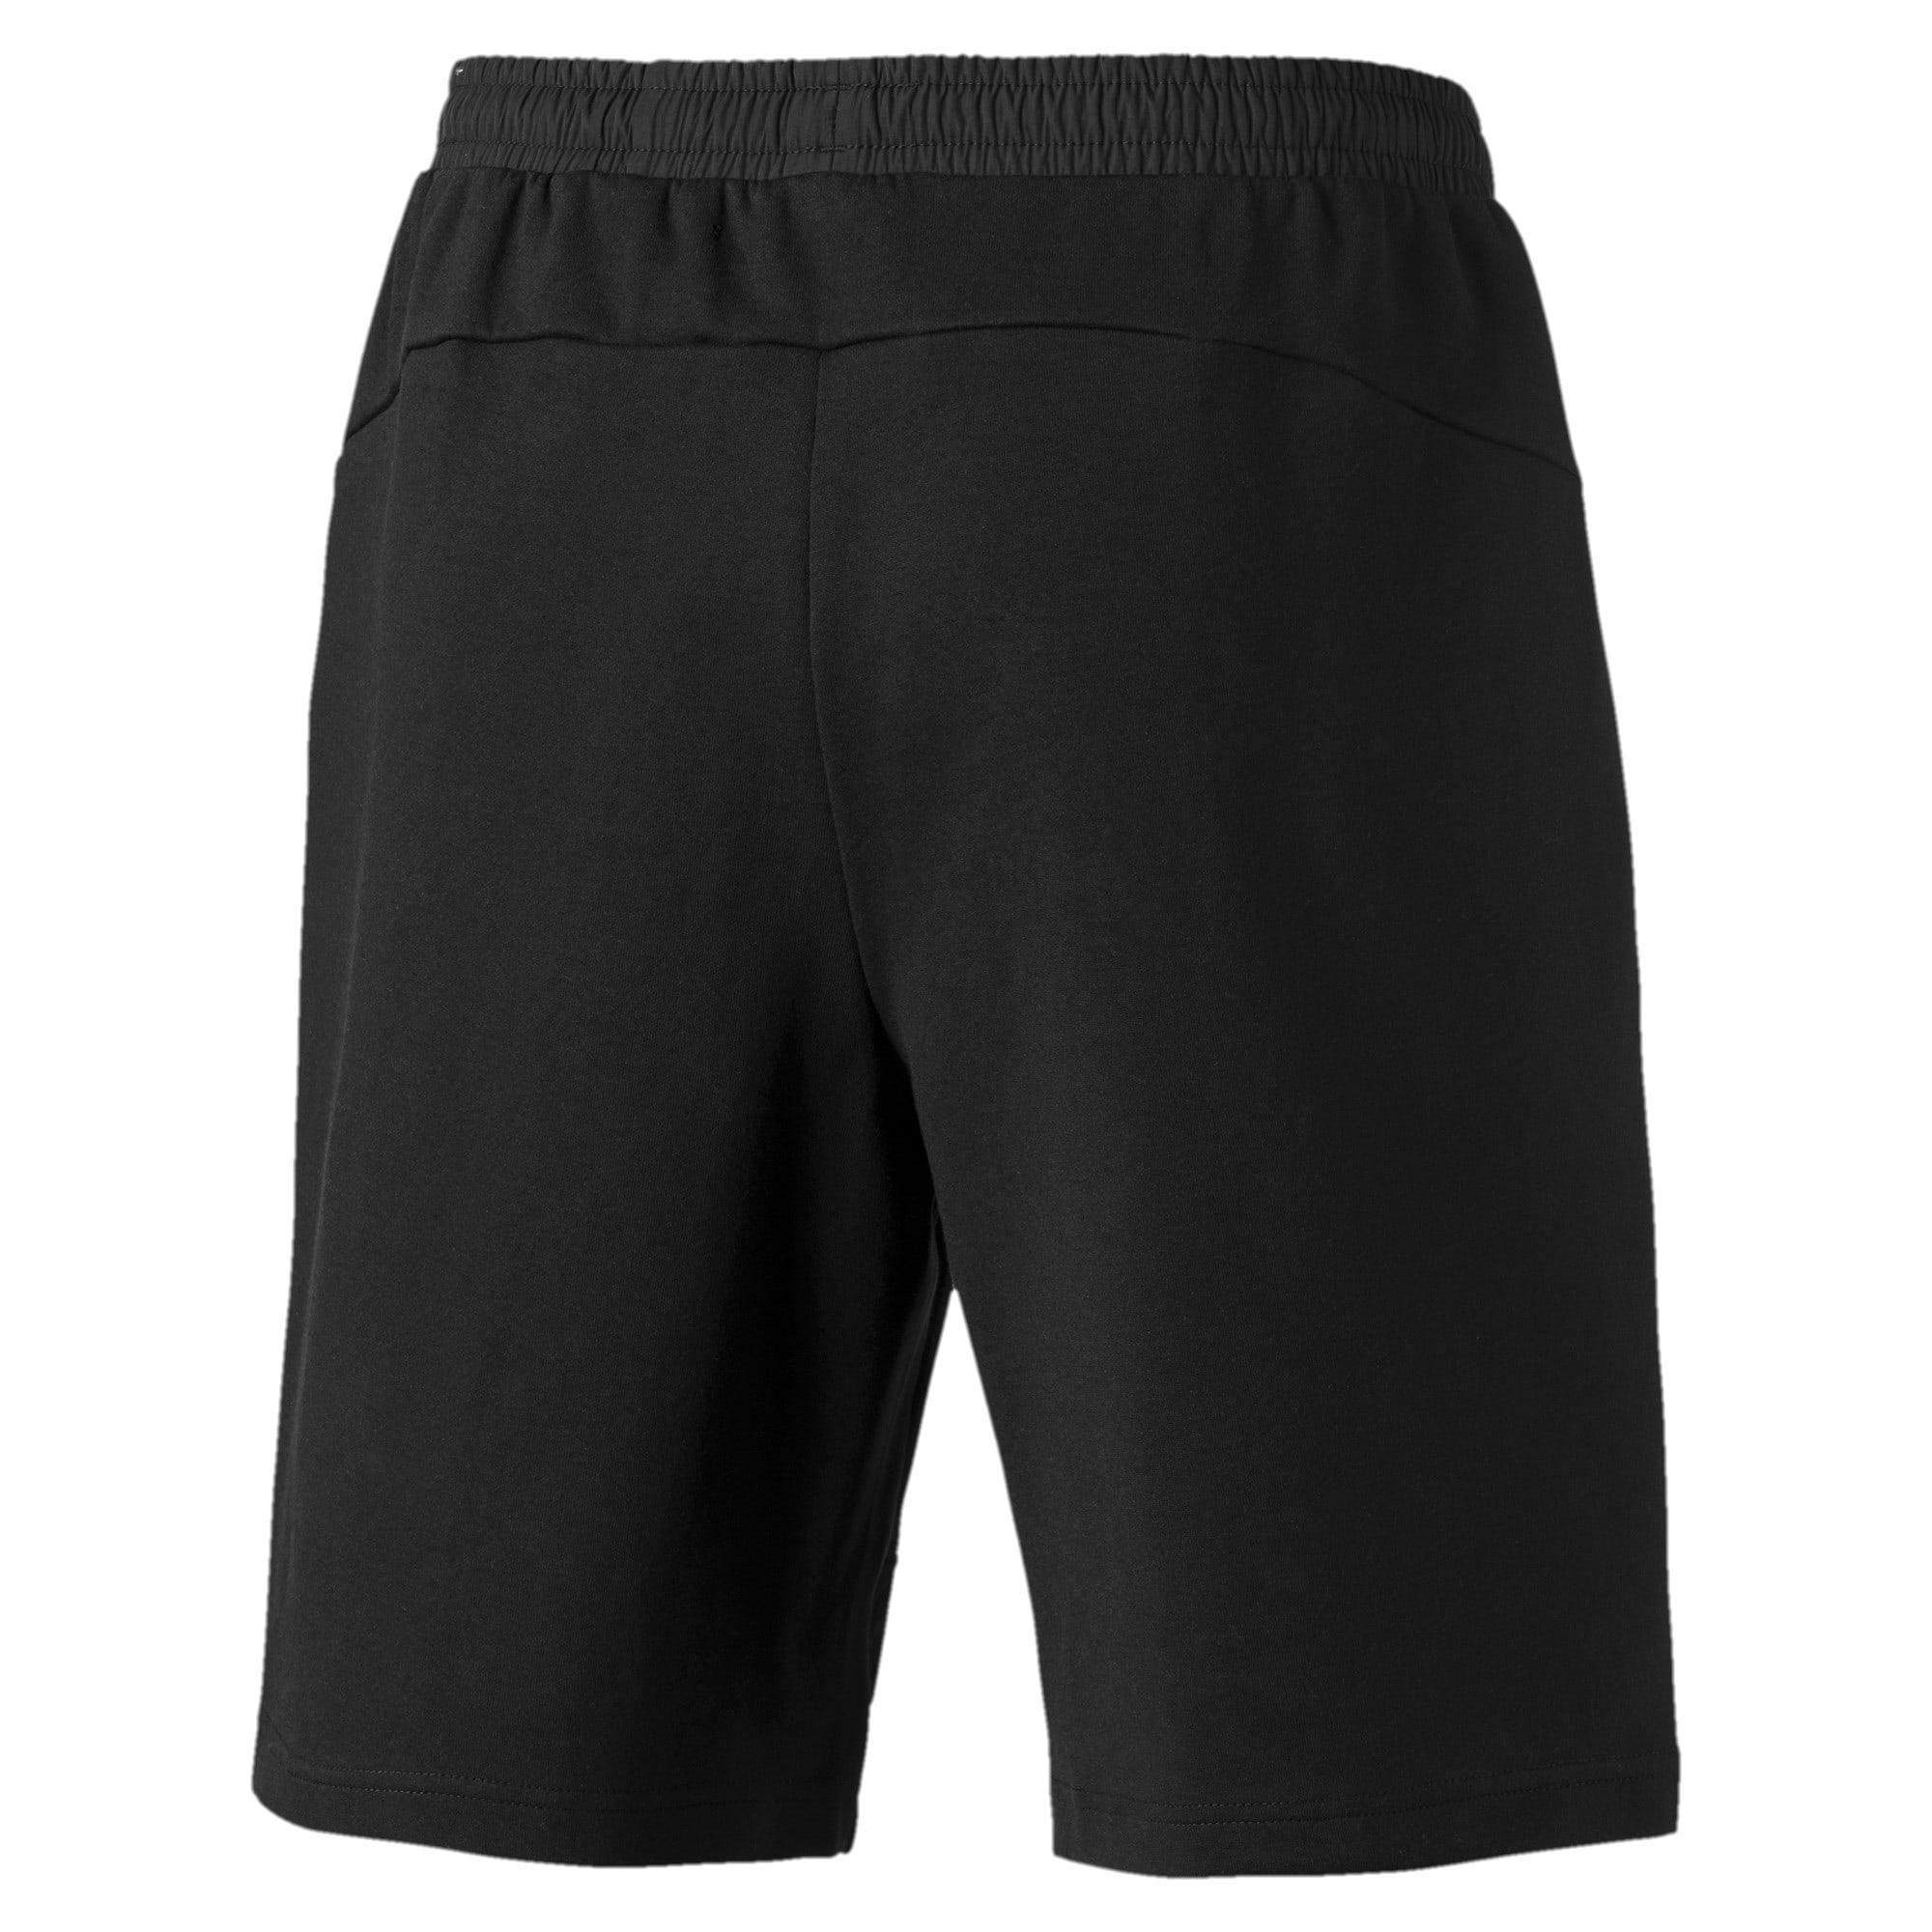 Thumbnail 5 of Evostripe Lite Herren Shorts, Puma Black, medium